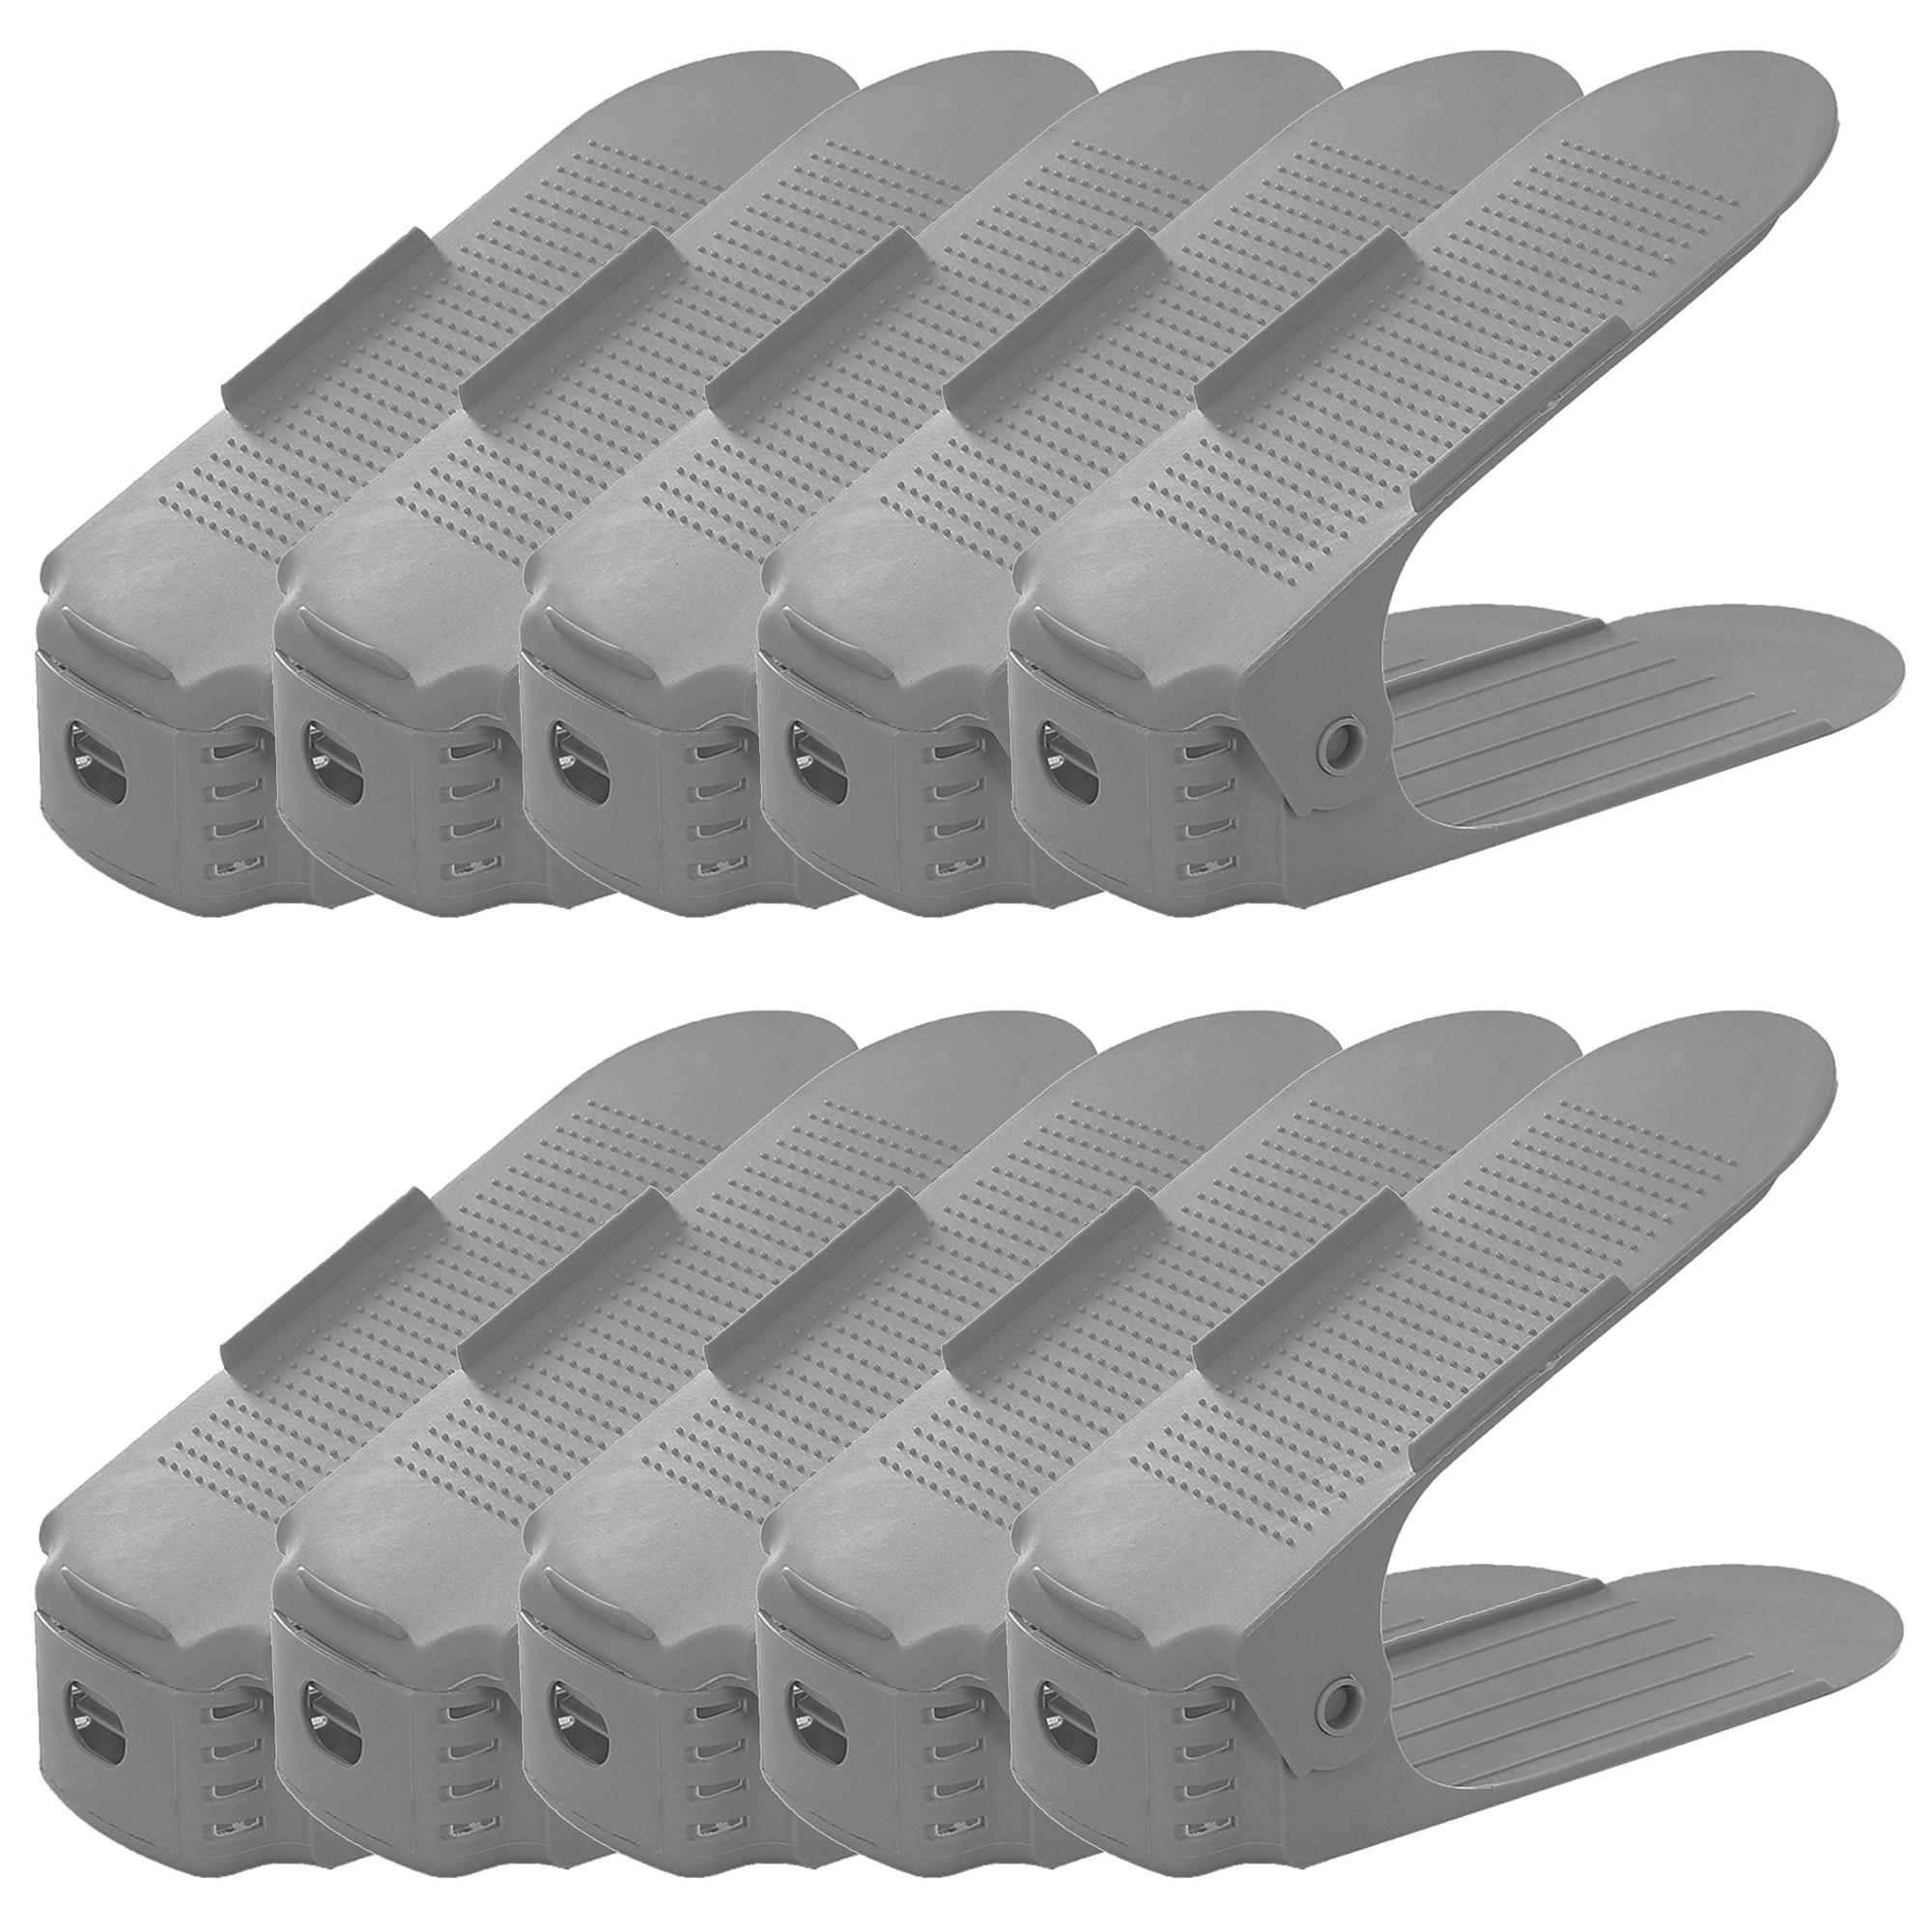 Fotografie Organizator pantofi Kring Organizer, 3 niveluri de reglare pe inaltime, suport incaltaminte, Gri inchis